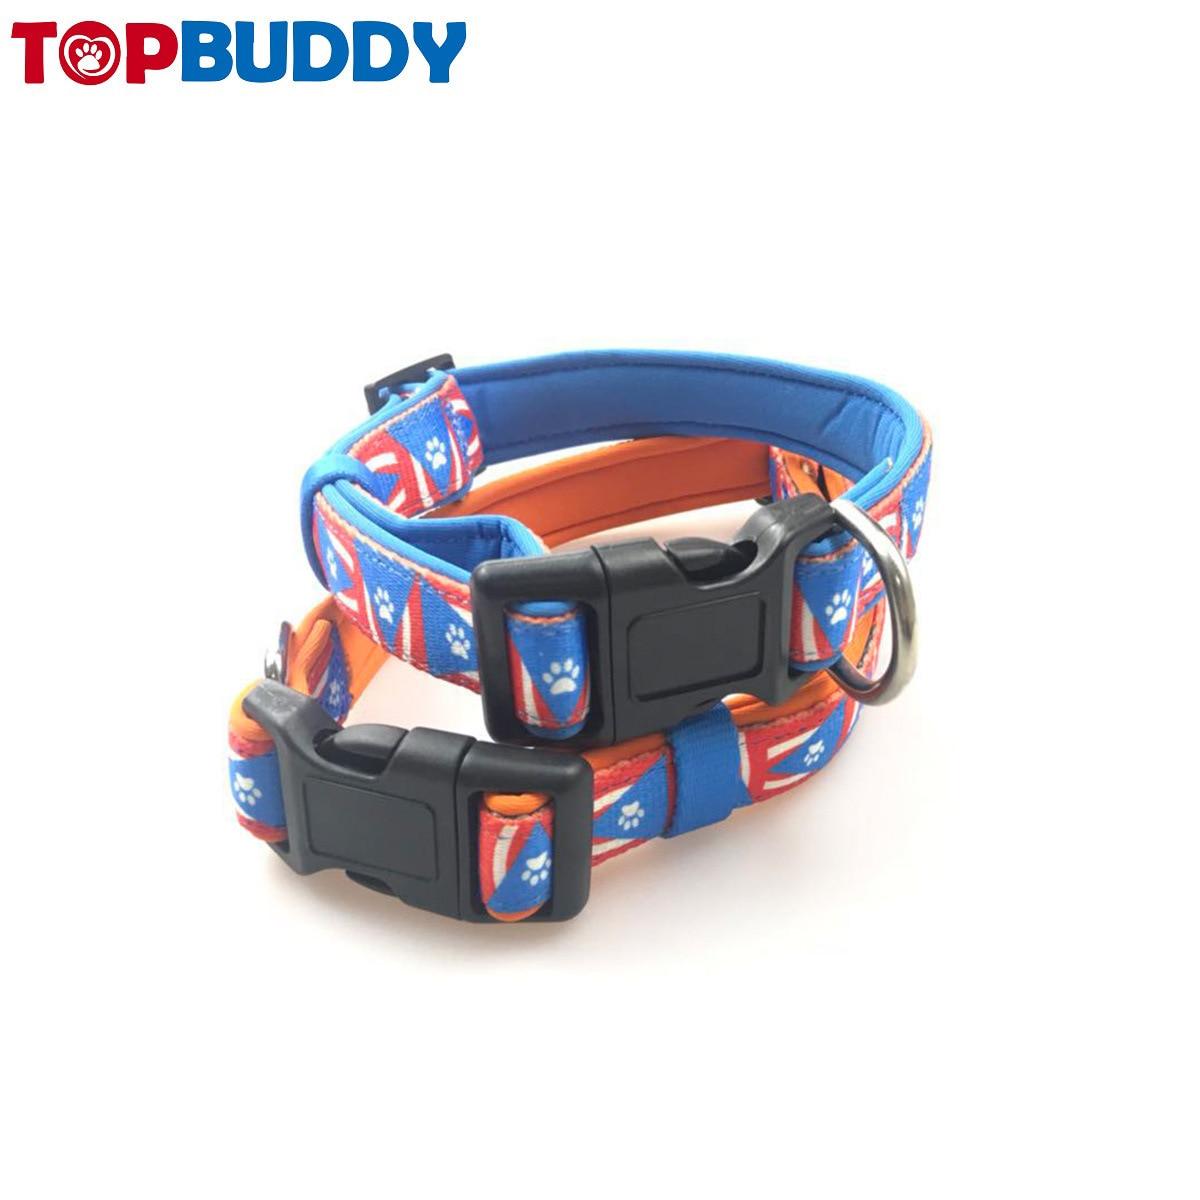 Release Buckle Diving Cloth Pet Collar Neoprene Pet Collar Waterproof Dog Chain Cute Pet Supplies